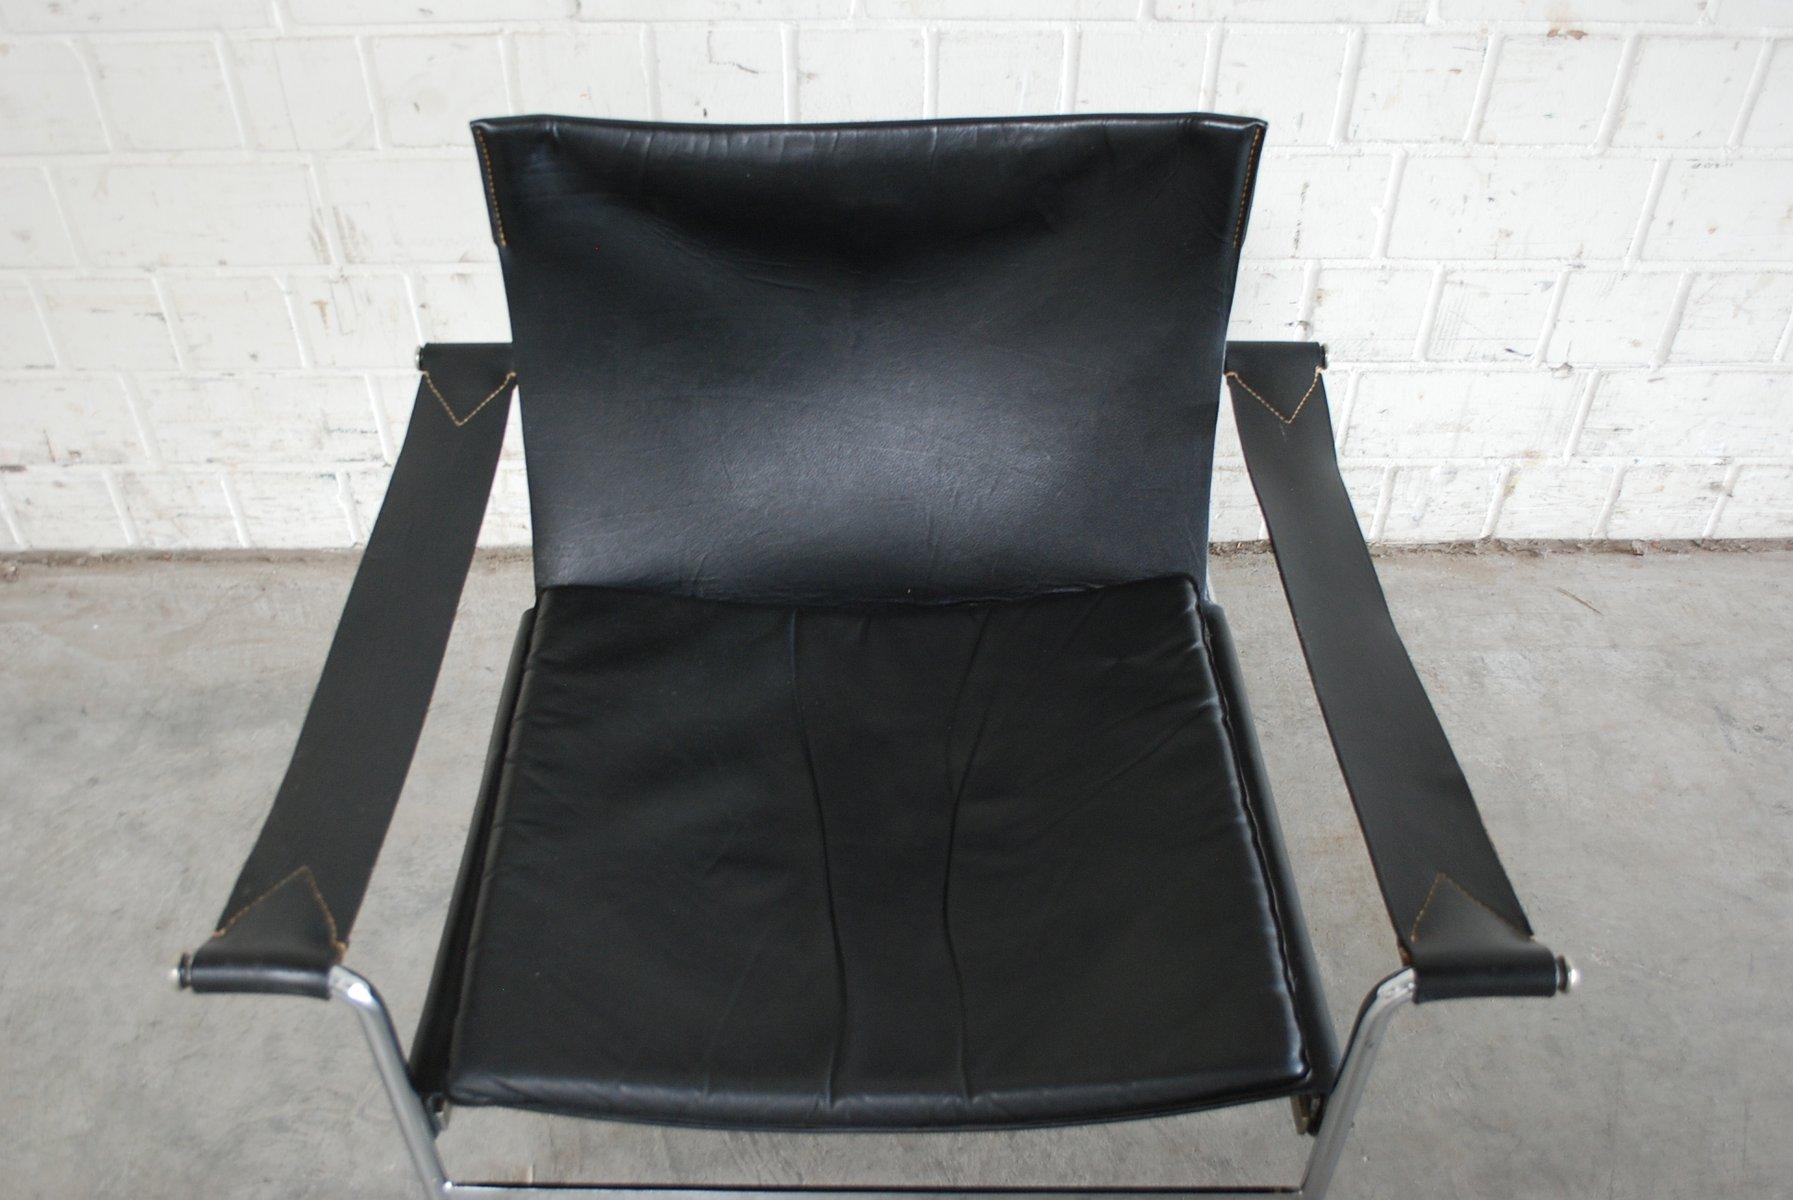 d99 leder lounge stuhl von hans k necke f r tecta 1969 bei pamono kaufen. Black Bedroom Furniture Sets. Home Design Ideas